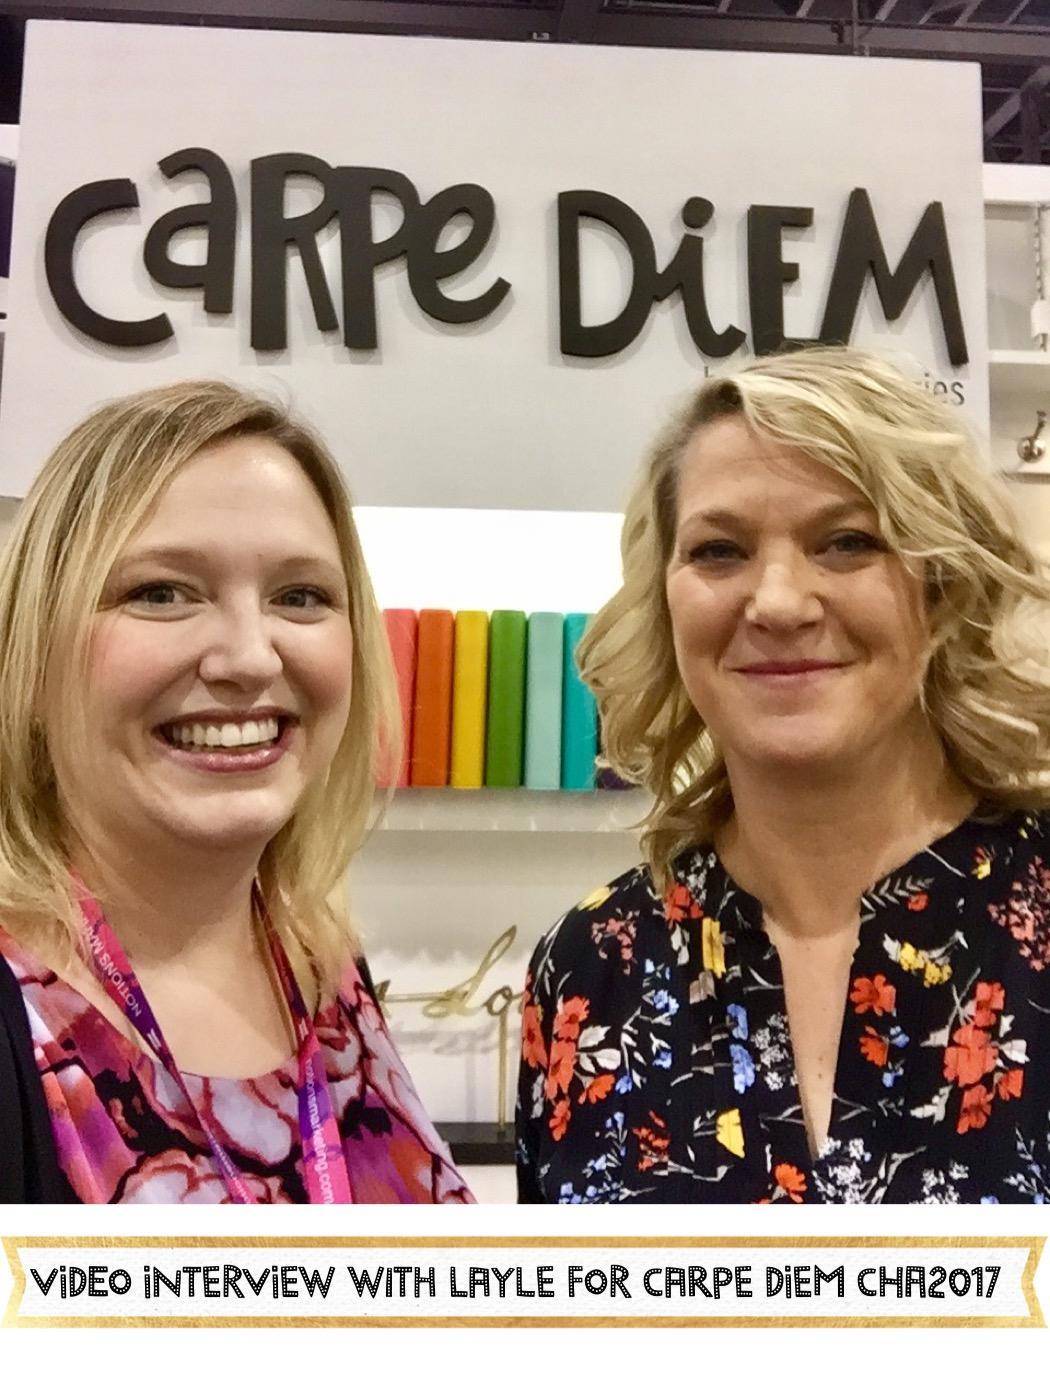 Alice and Layle Koncar Carpe Diem CHA2017